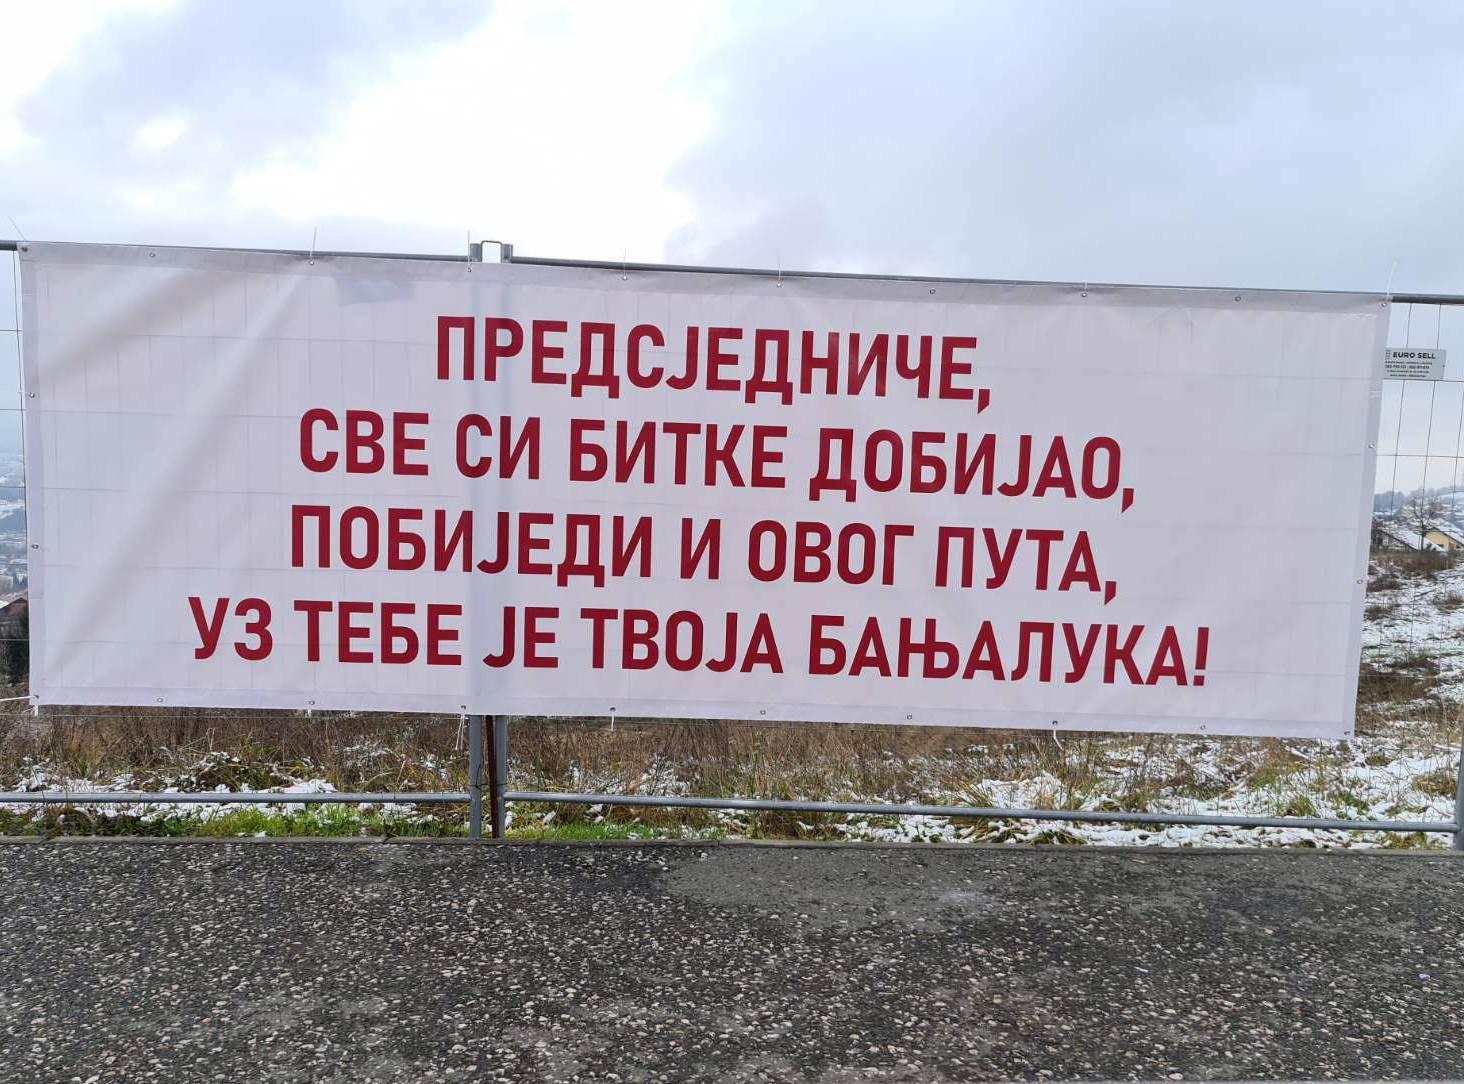 pano, Dodik